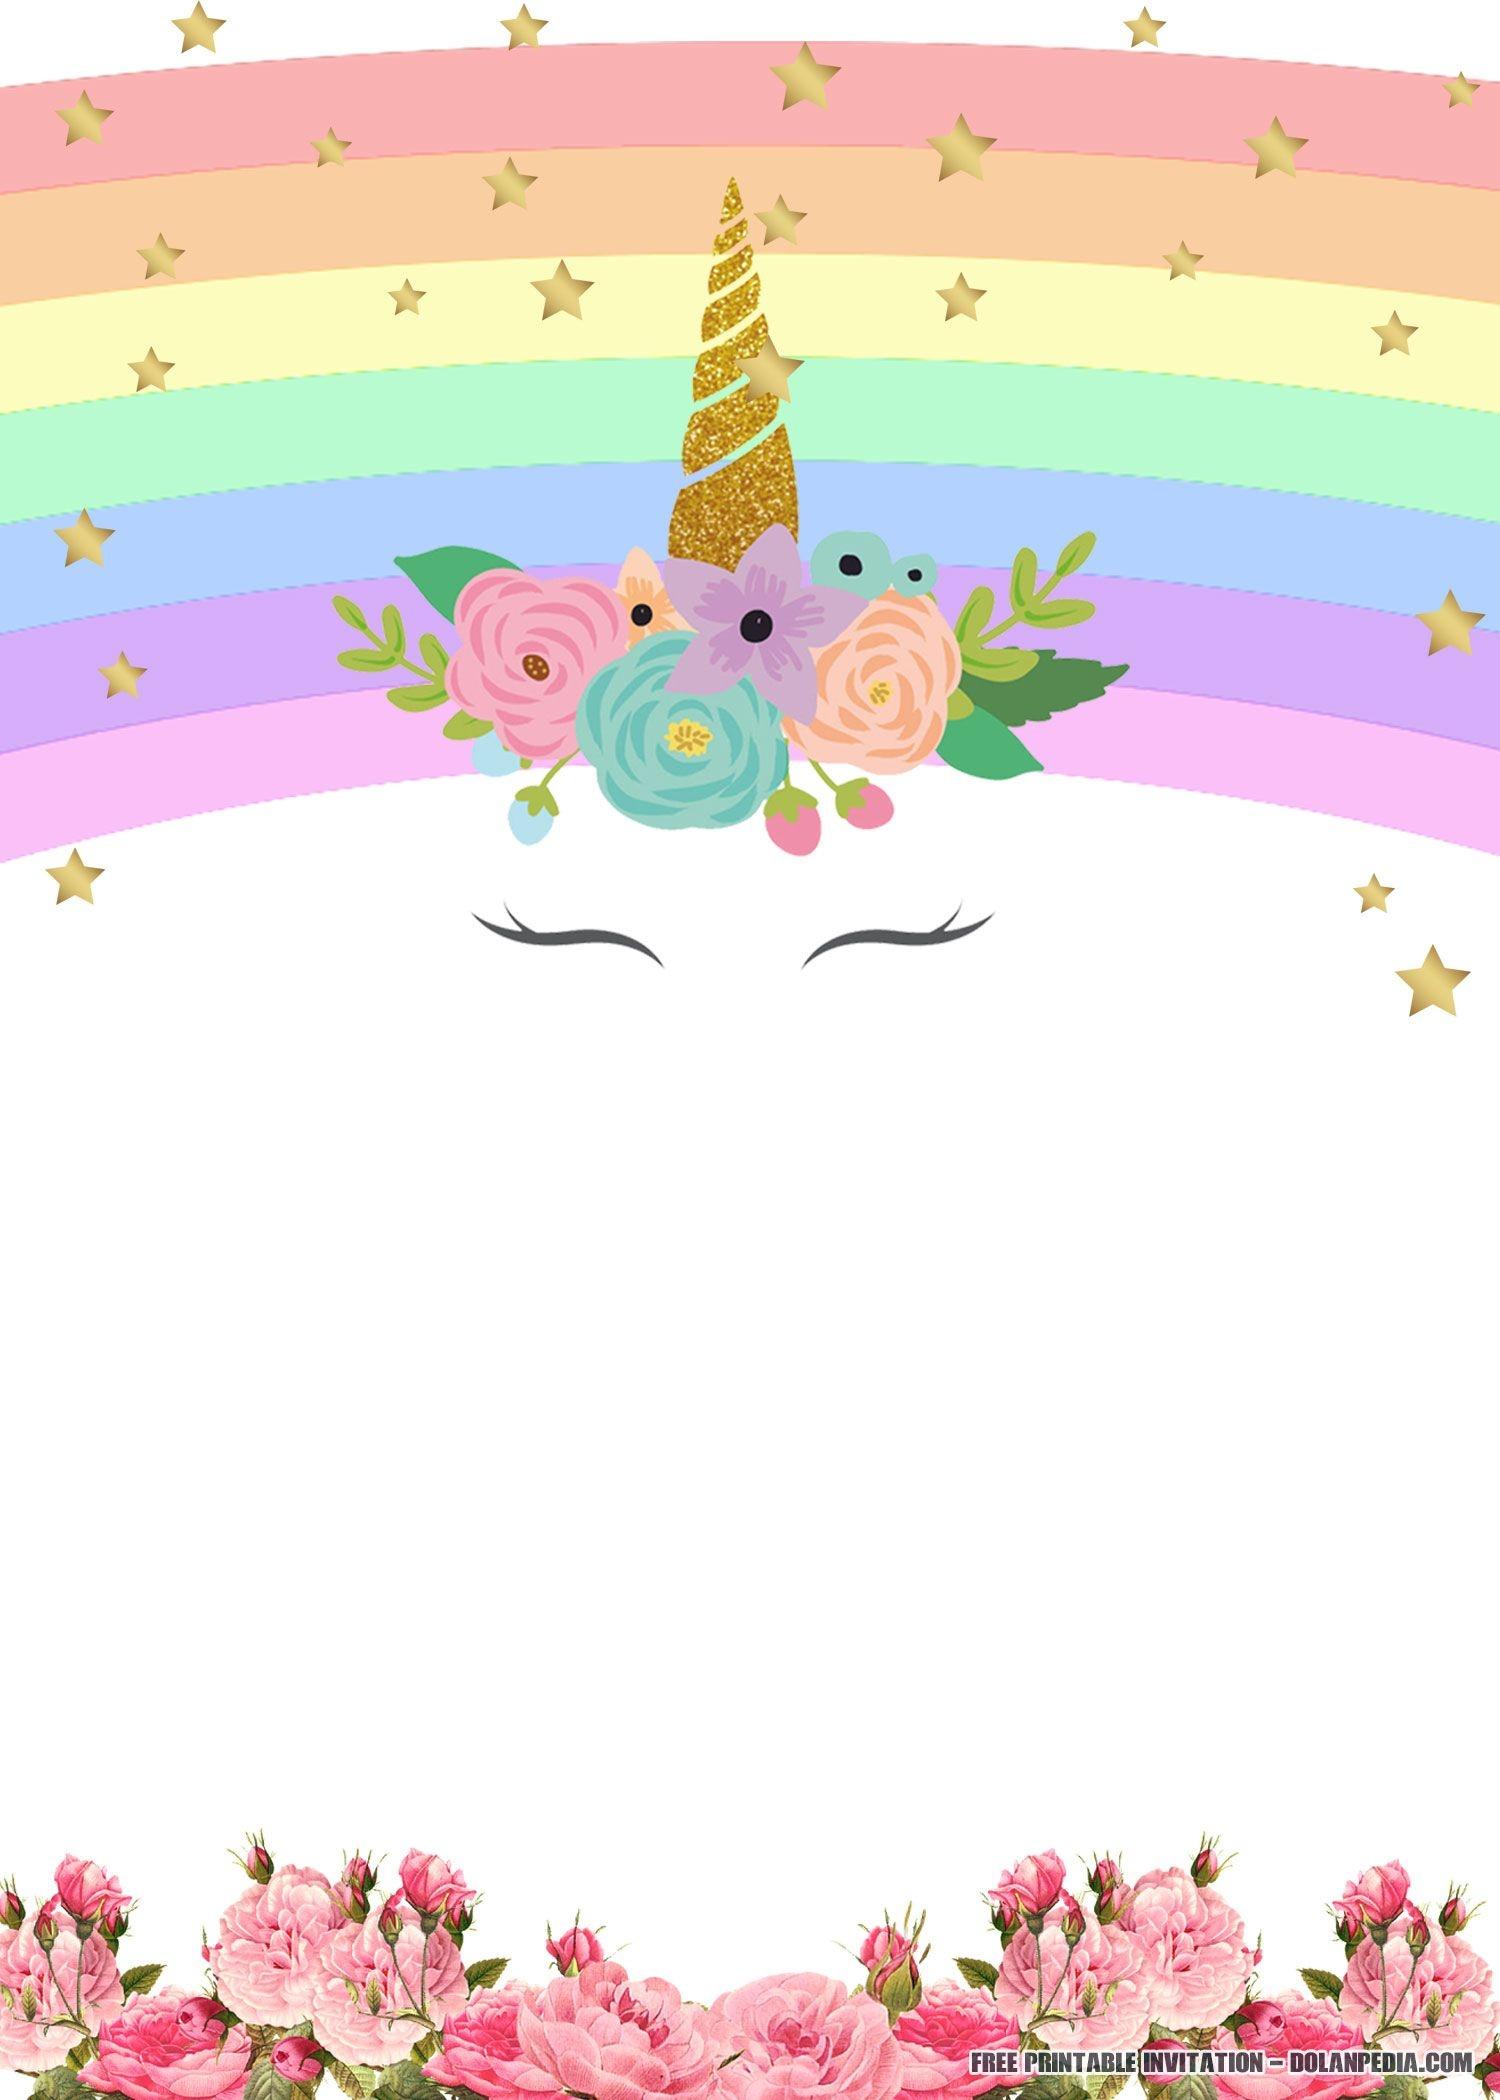 Free Printable Golden Unicorn Birthday Invitation Template | Unicorn - Free Printable Unicorn Birthday Invitations